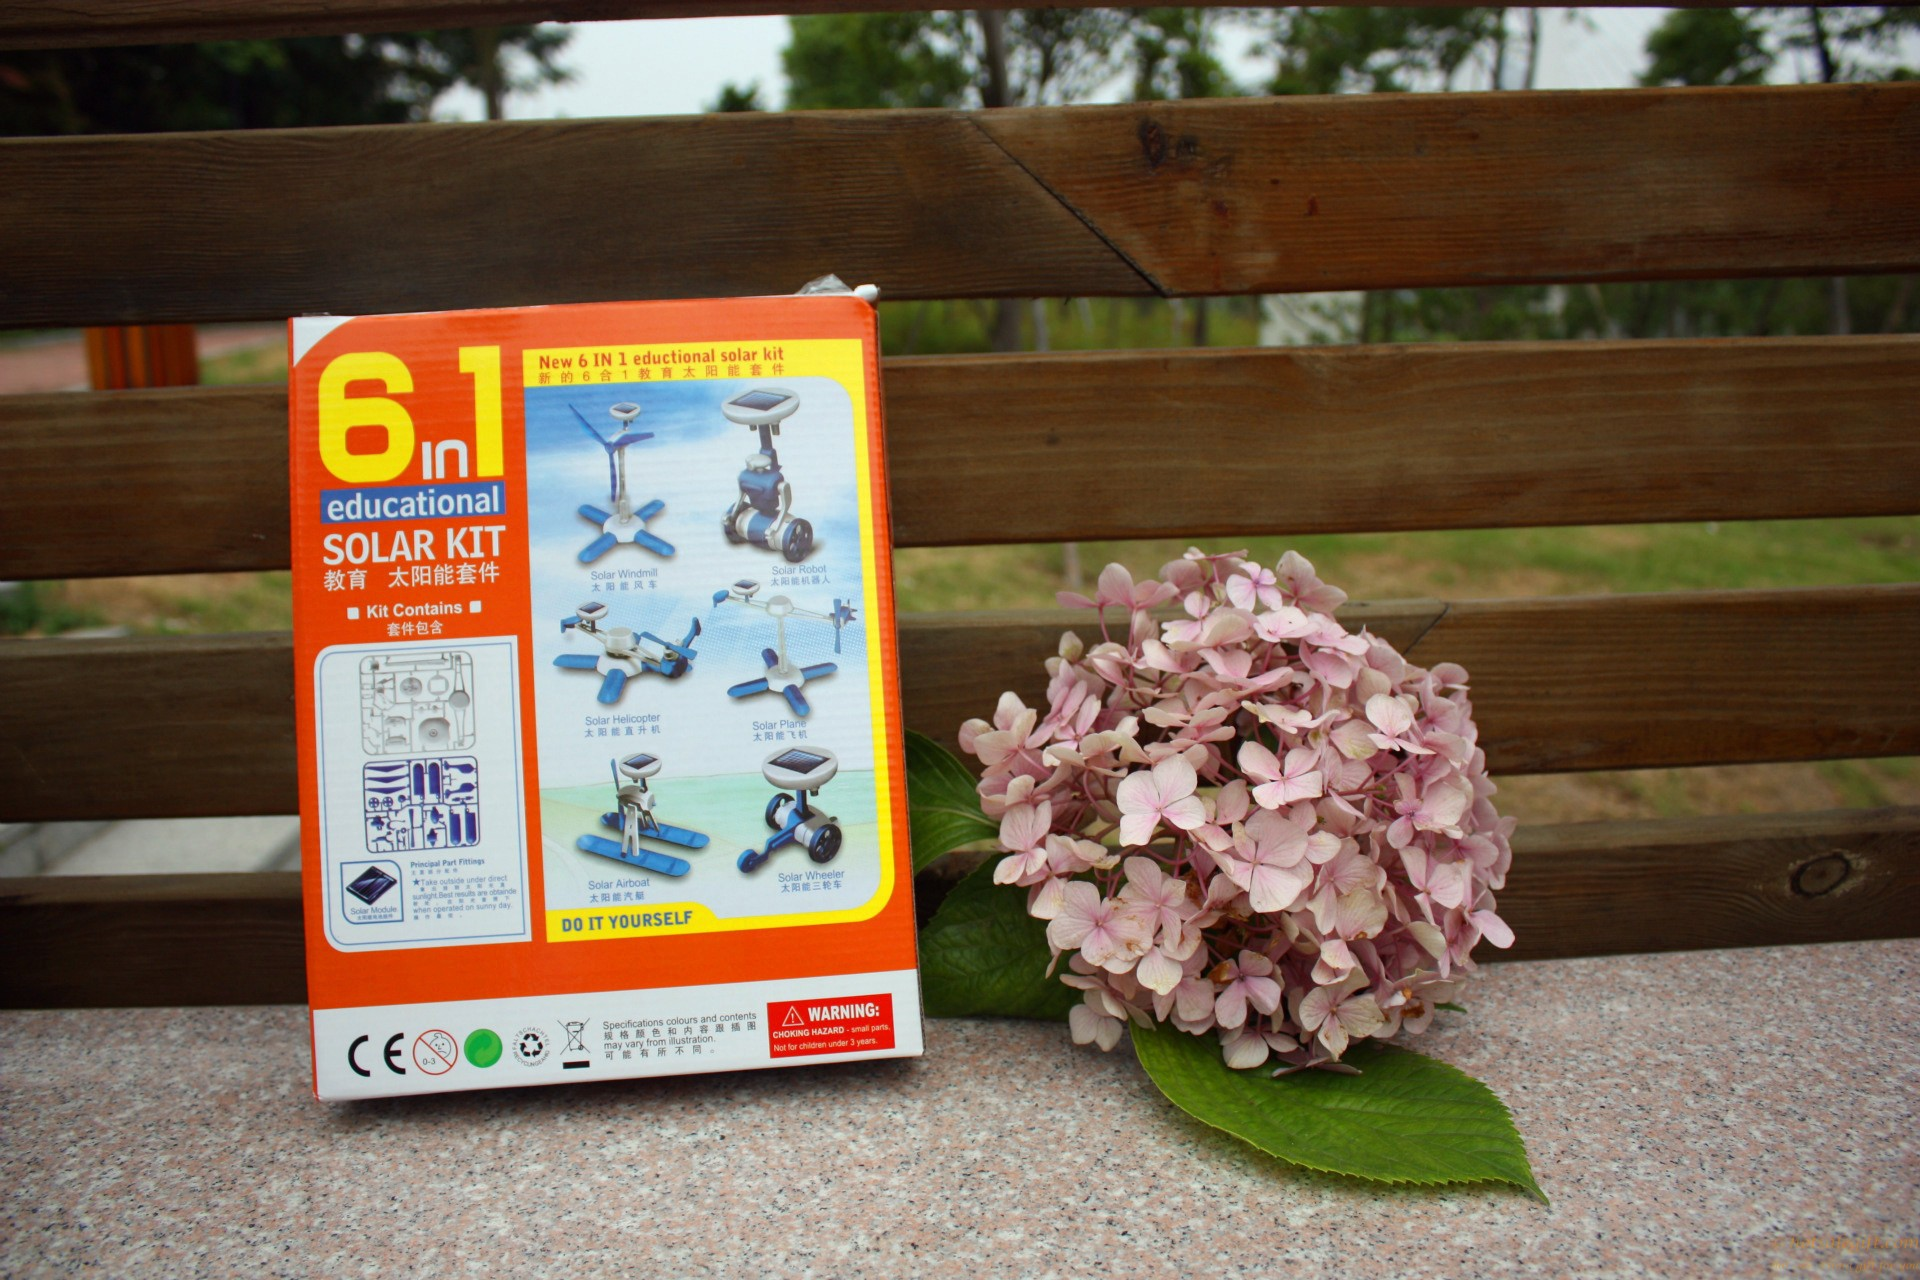 6 in 1 educational solar kit solar DIY toys for boys